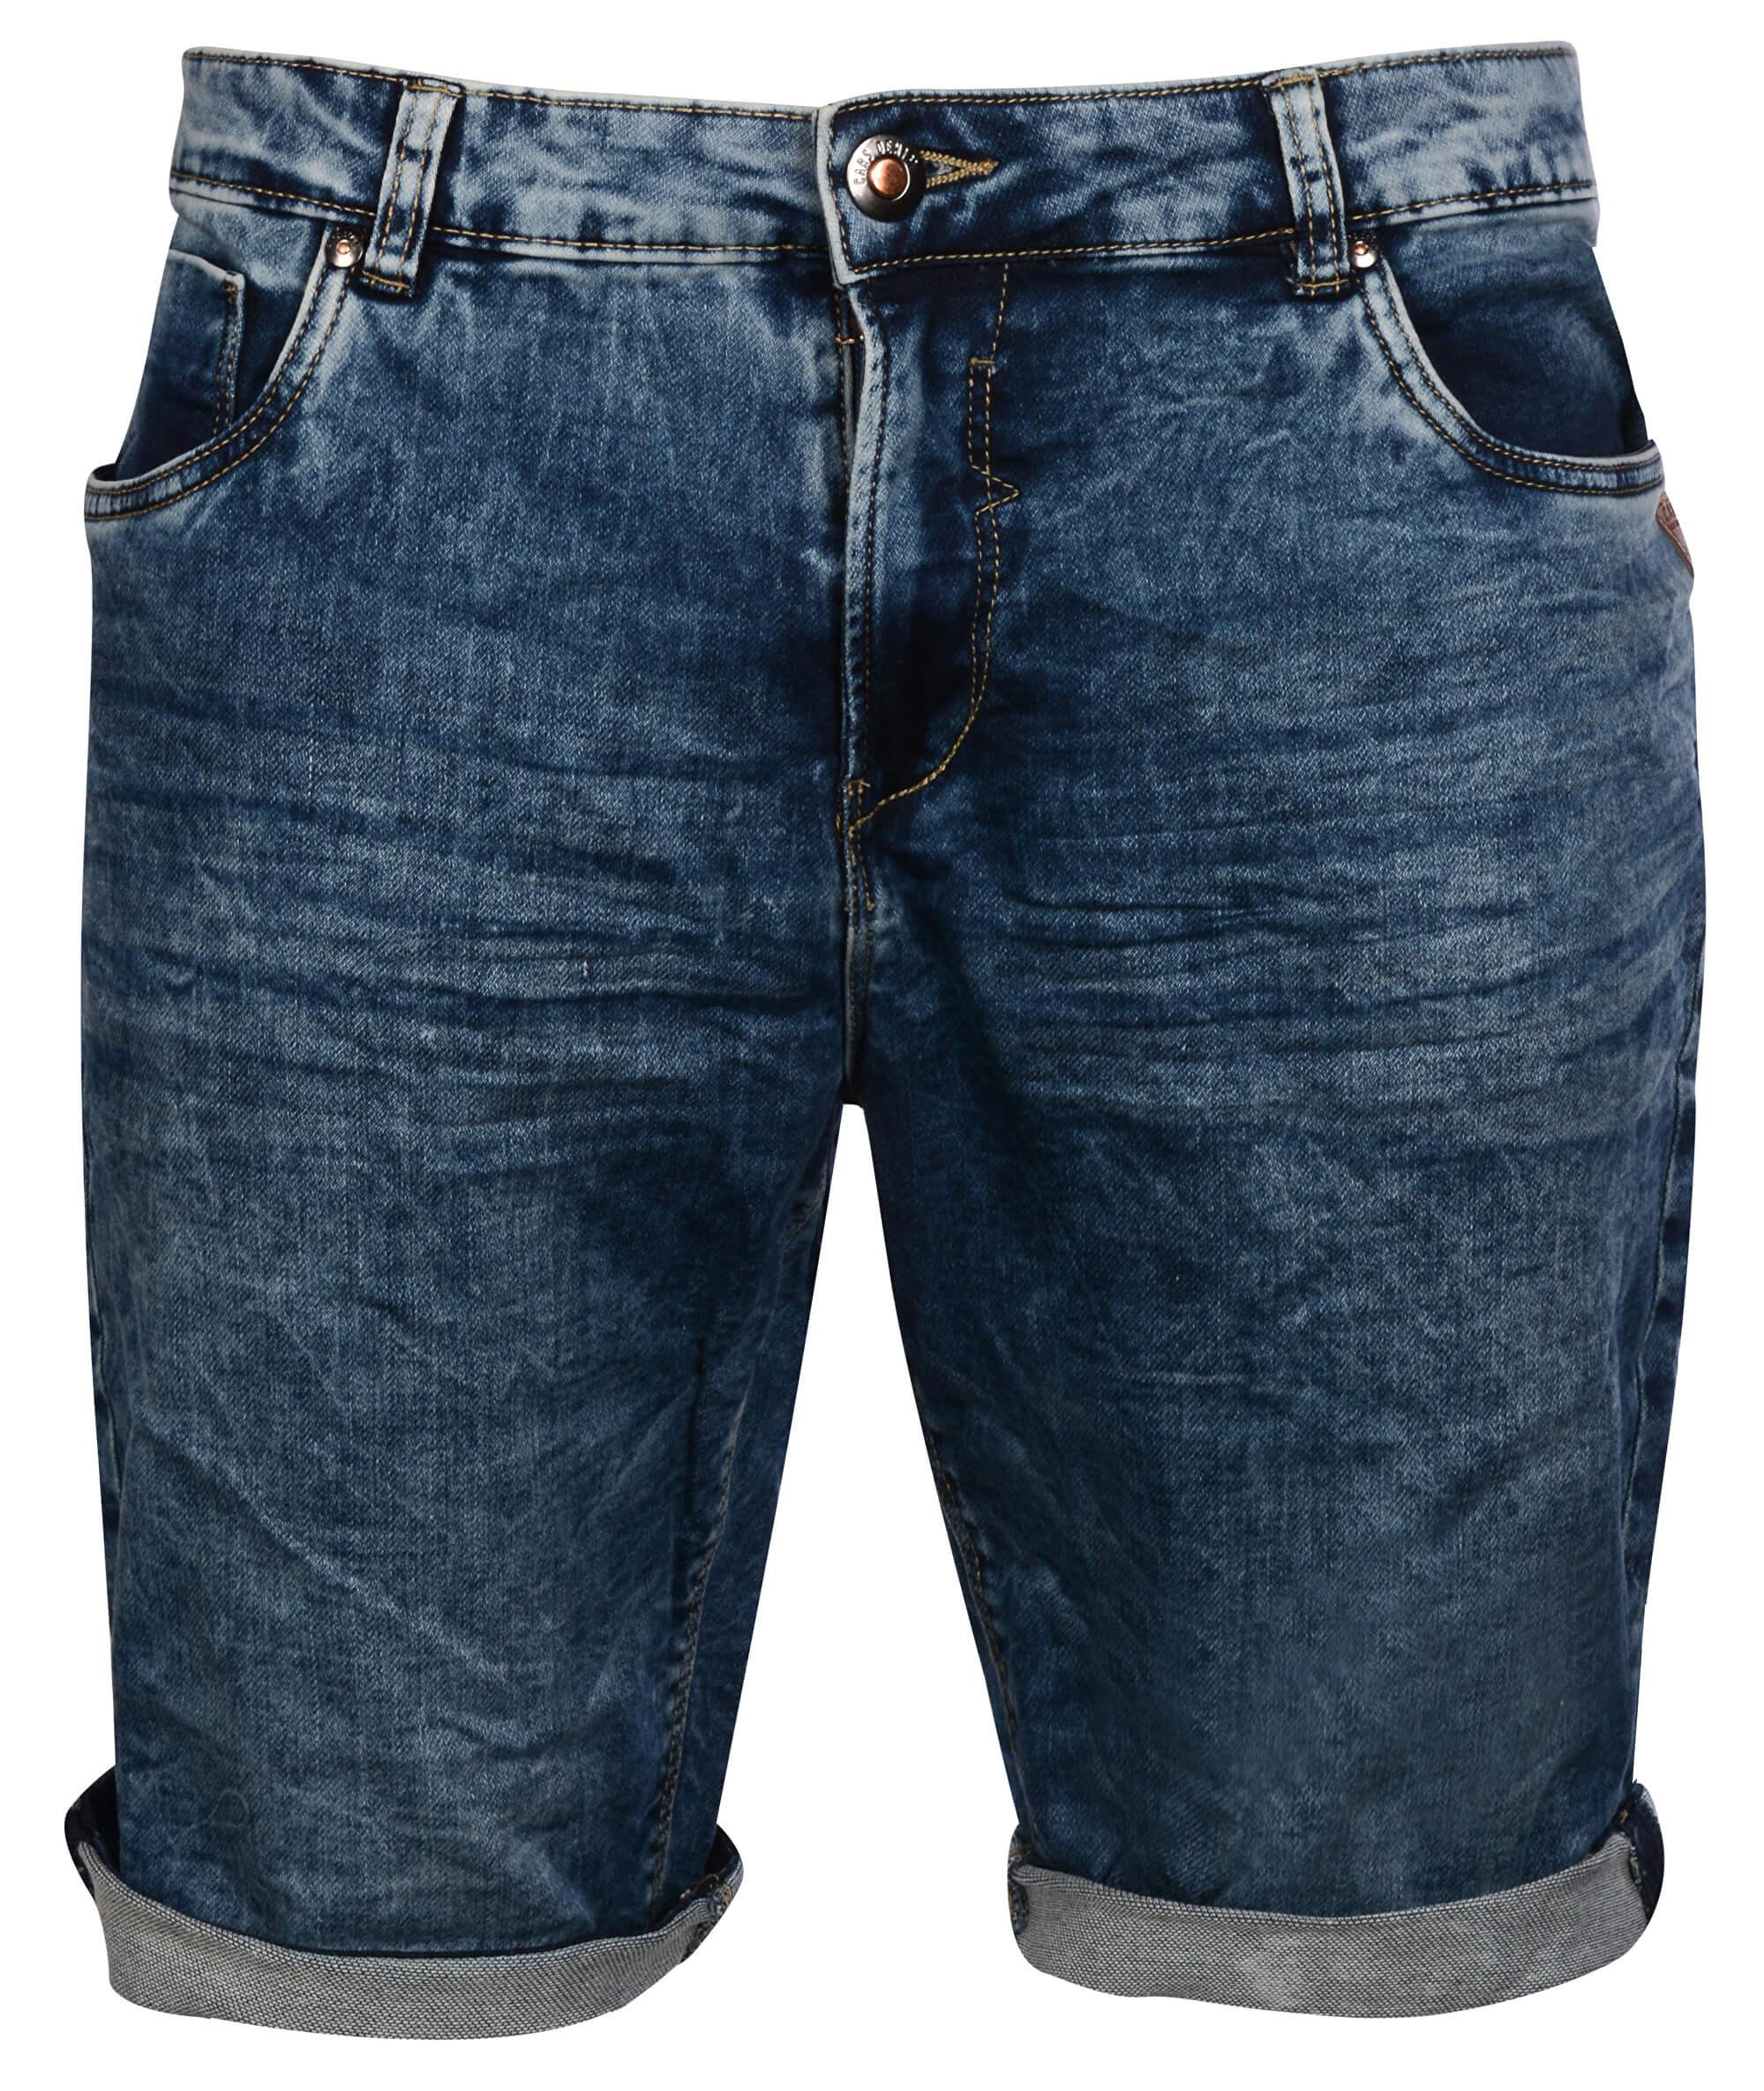 7a32025fcfc Cars Jeans Pánské modré kraťasy Arizona STW 4962806